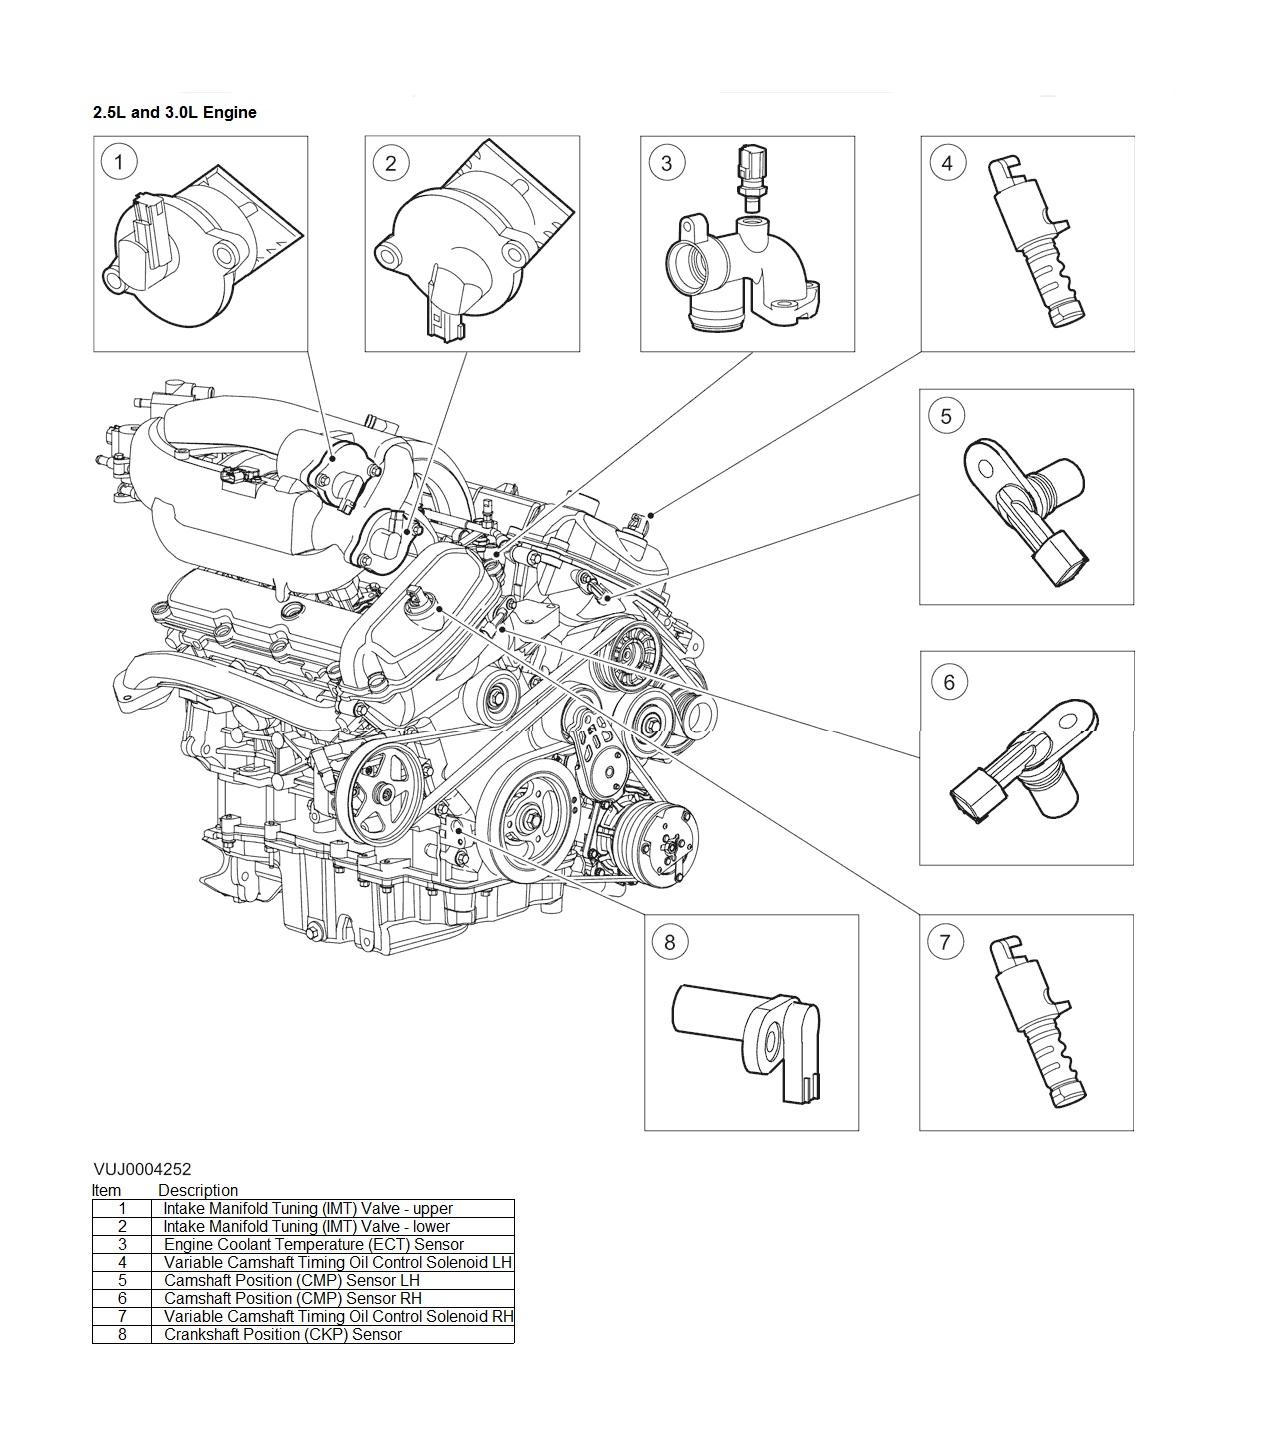 hight resolution of jaguar type stereo wiring diagram wiring diagram databasejaguar xj8 fuel filter location wiring diagram database jaguar